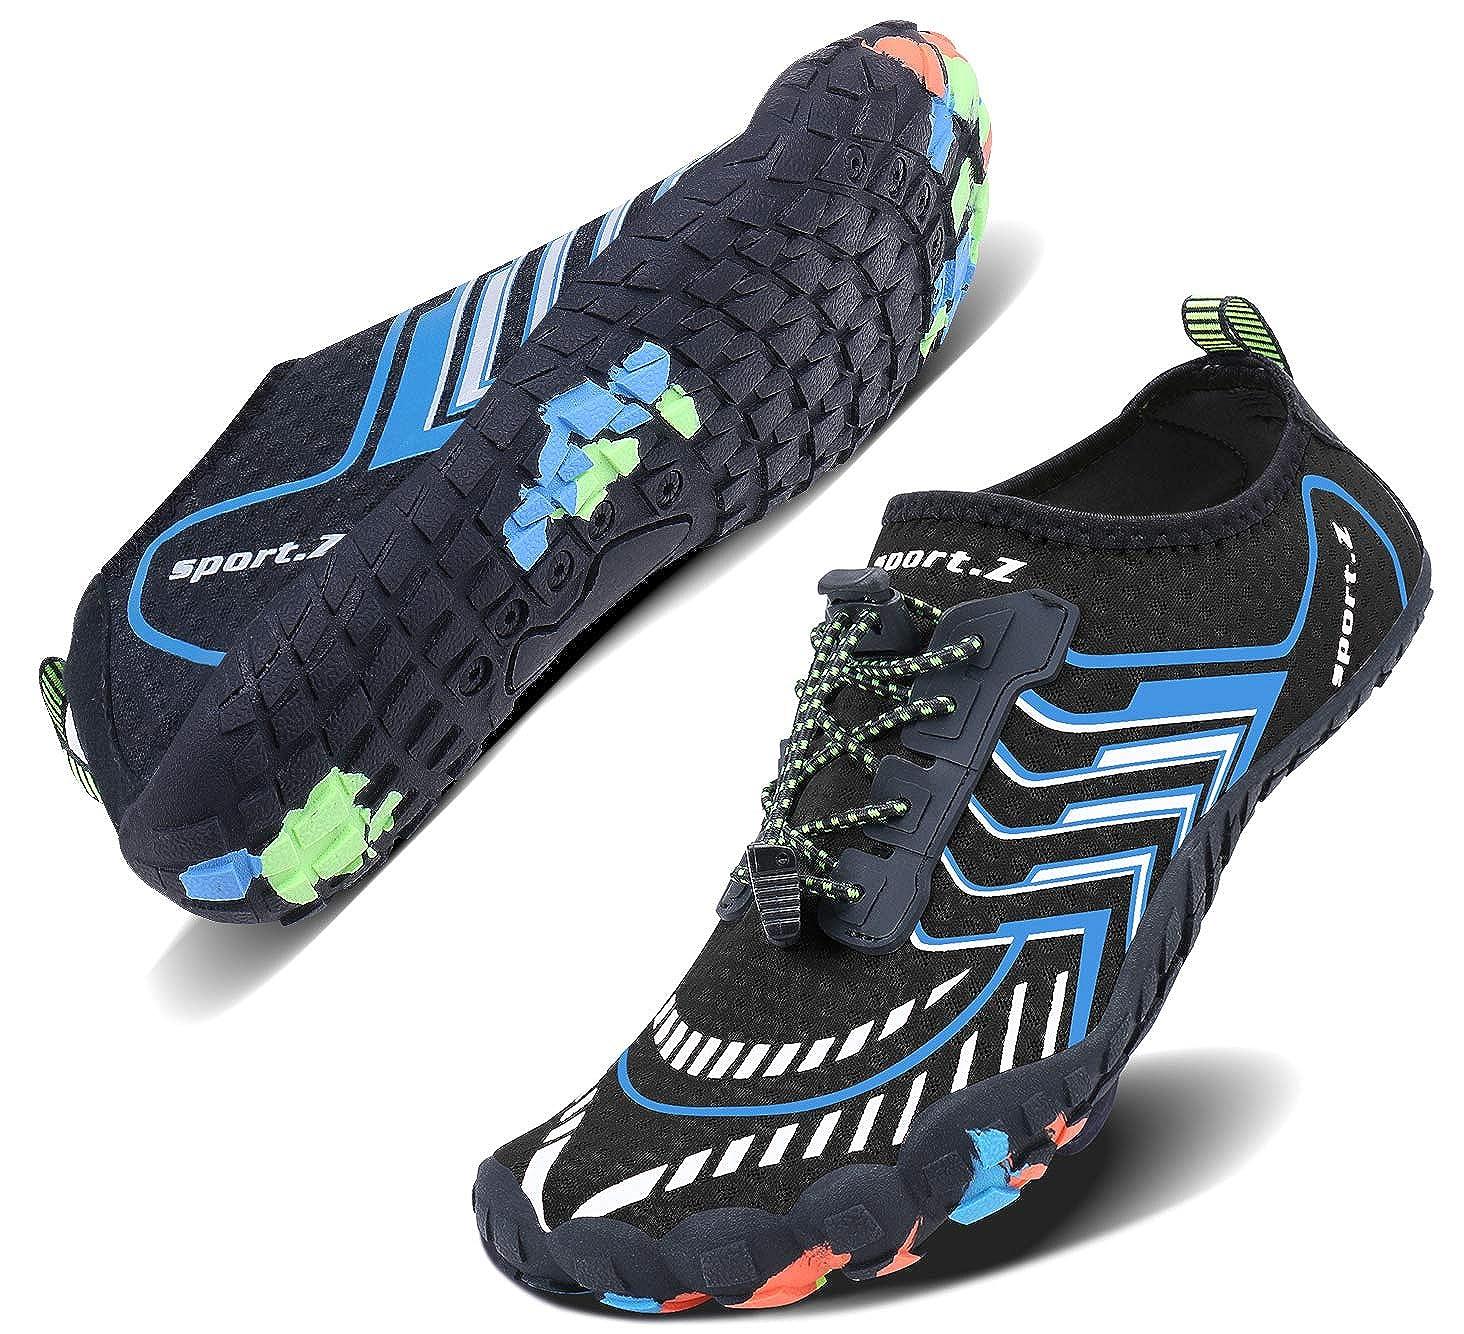 bluee_1 Wonesion Mens Womens Water Sport shoes Quick Dry Aqua Socks Barefoot Outdoor Beach Swim Surf Pool Yoga shoes